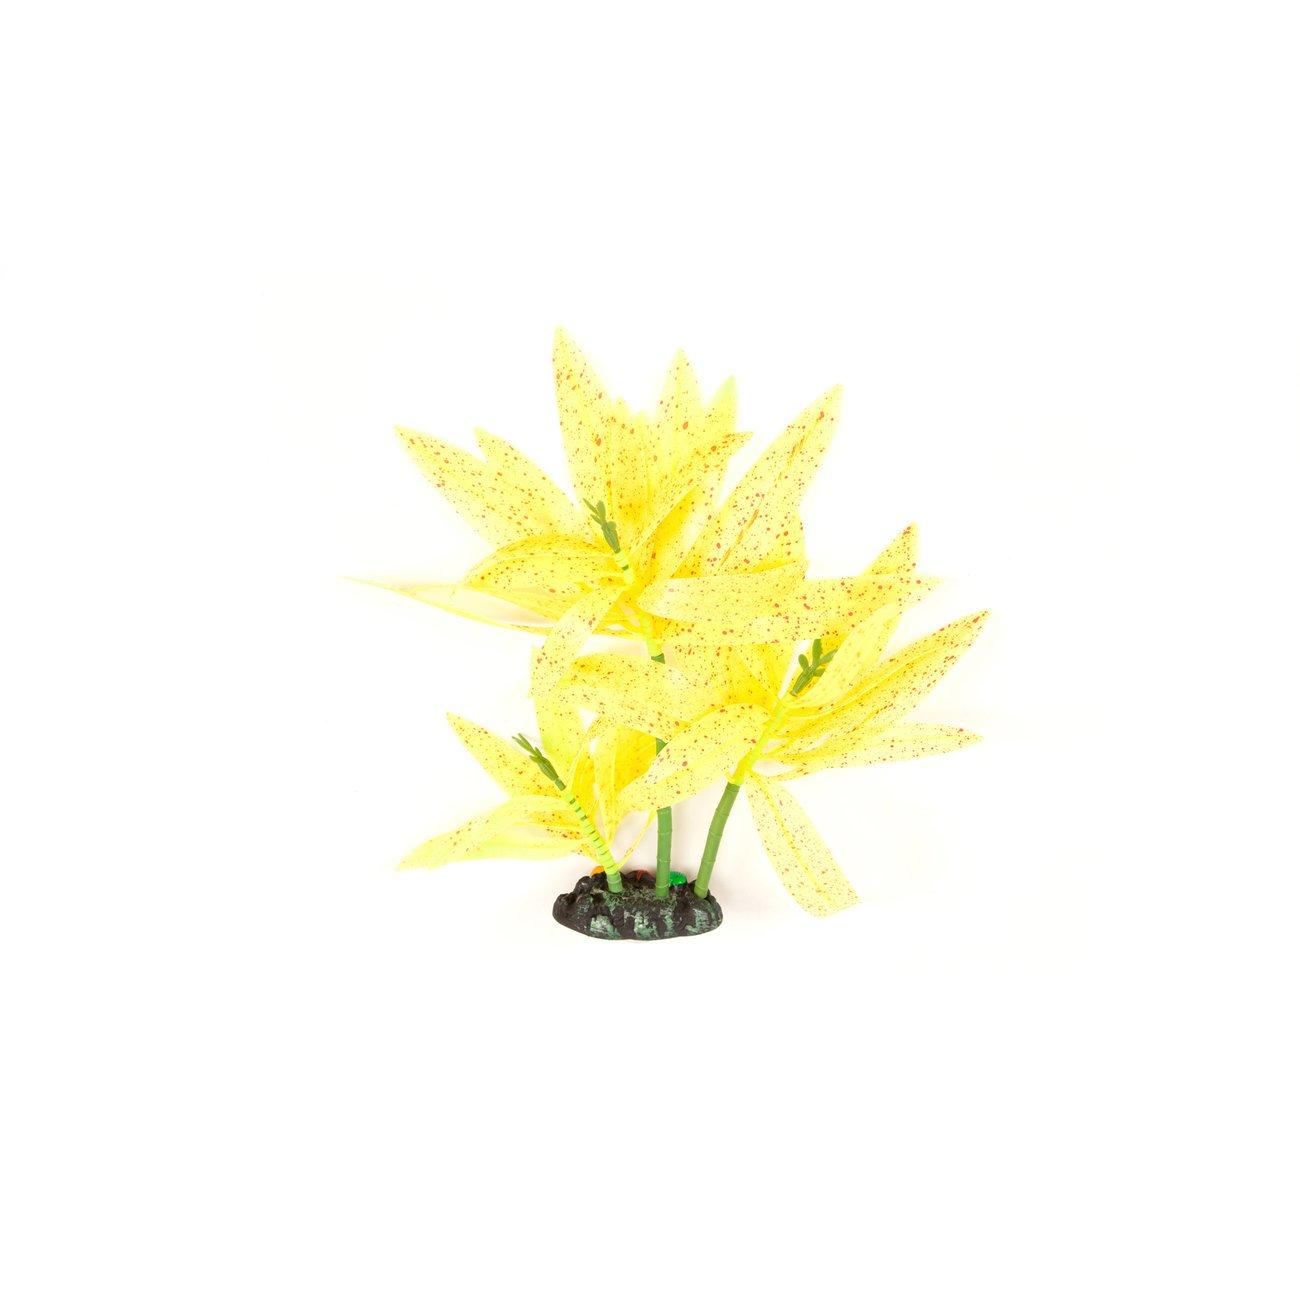 Aquatlantis Aqua Glow Sternenbaum, Bild 3